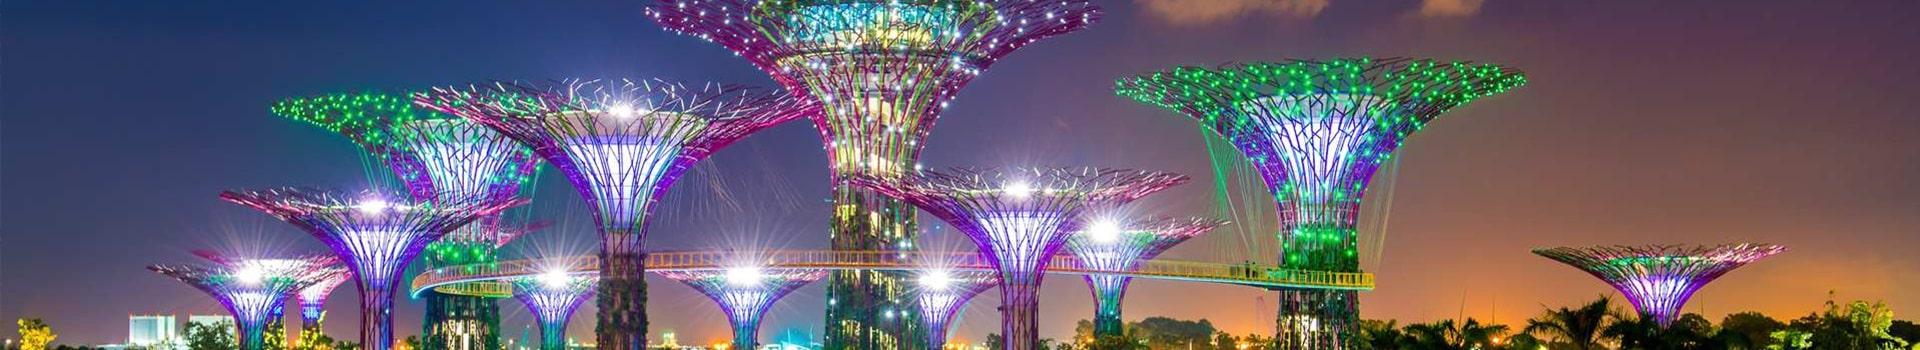 g-singapore-1-min